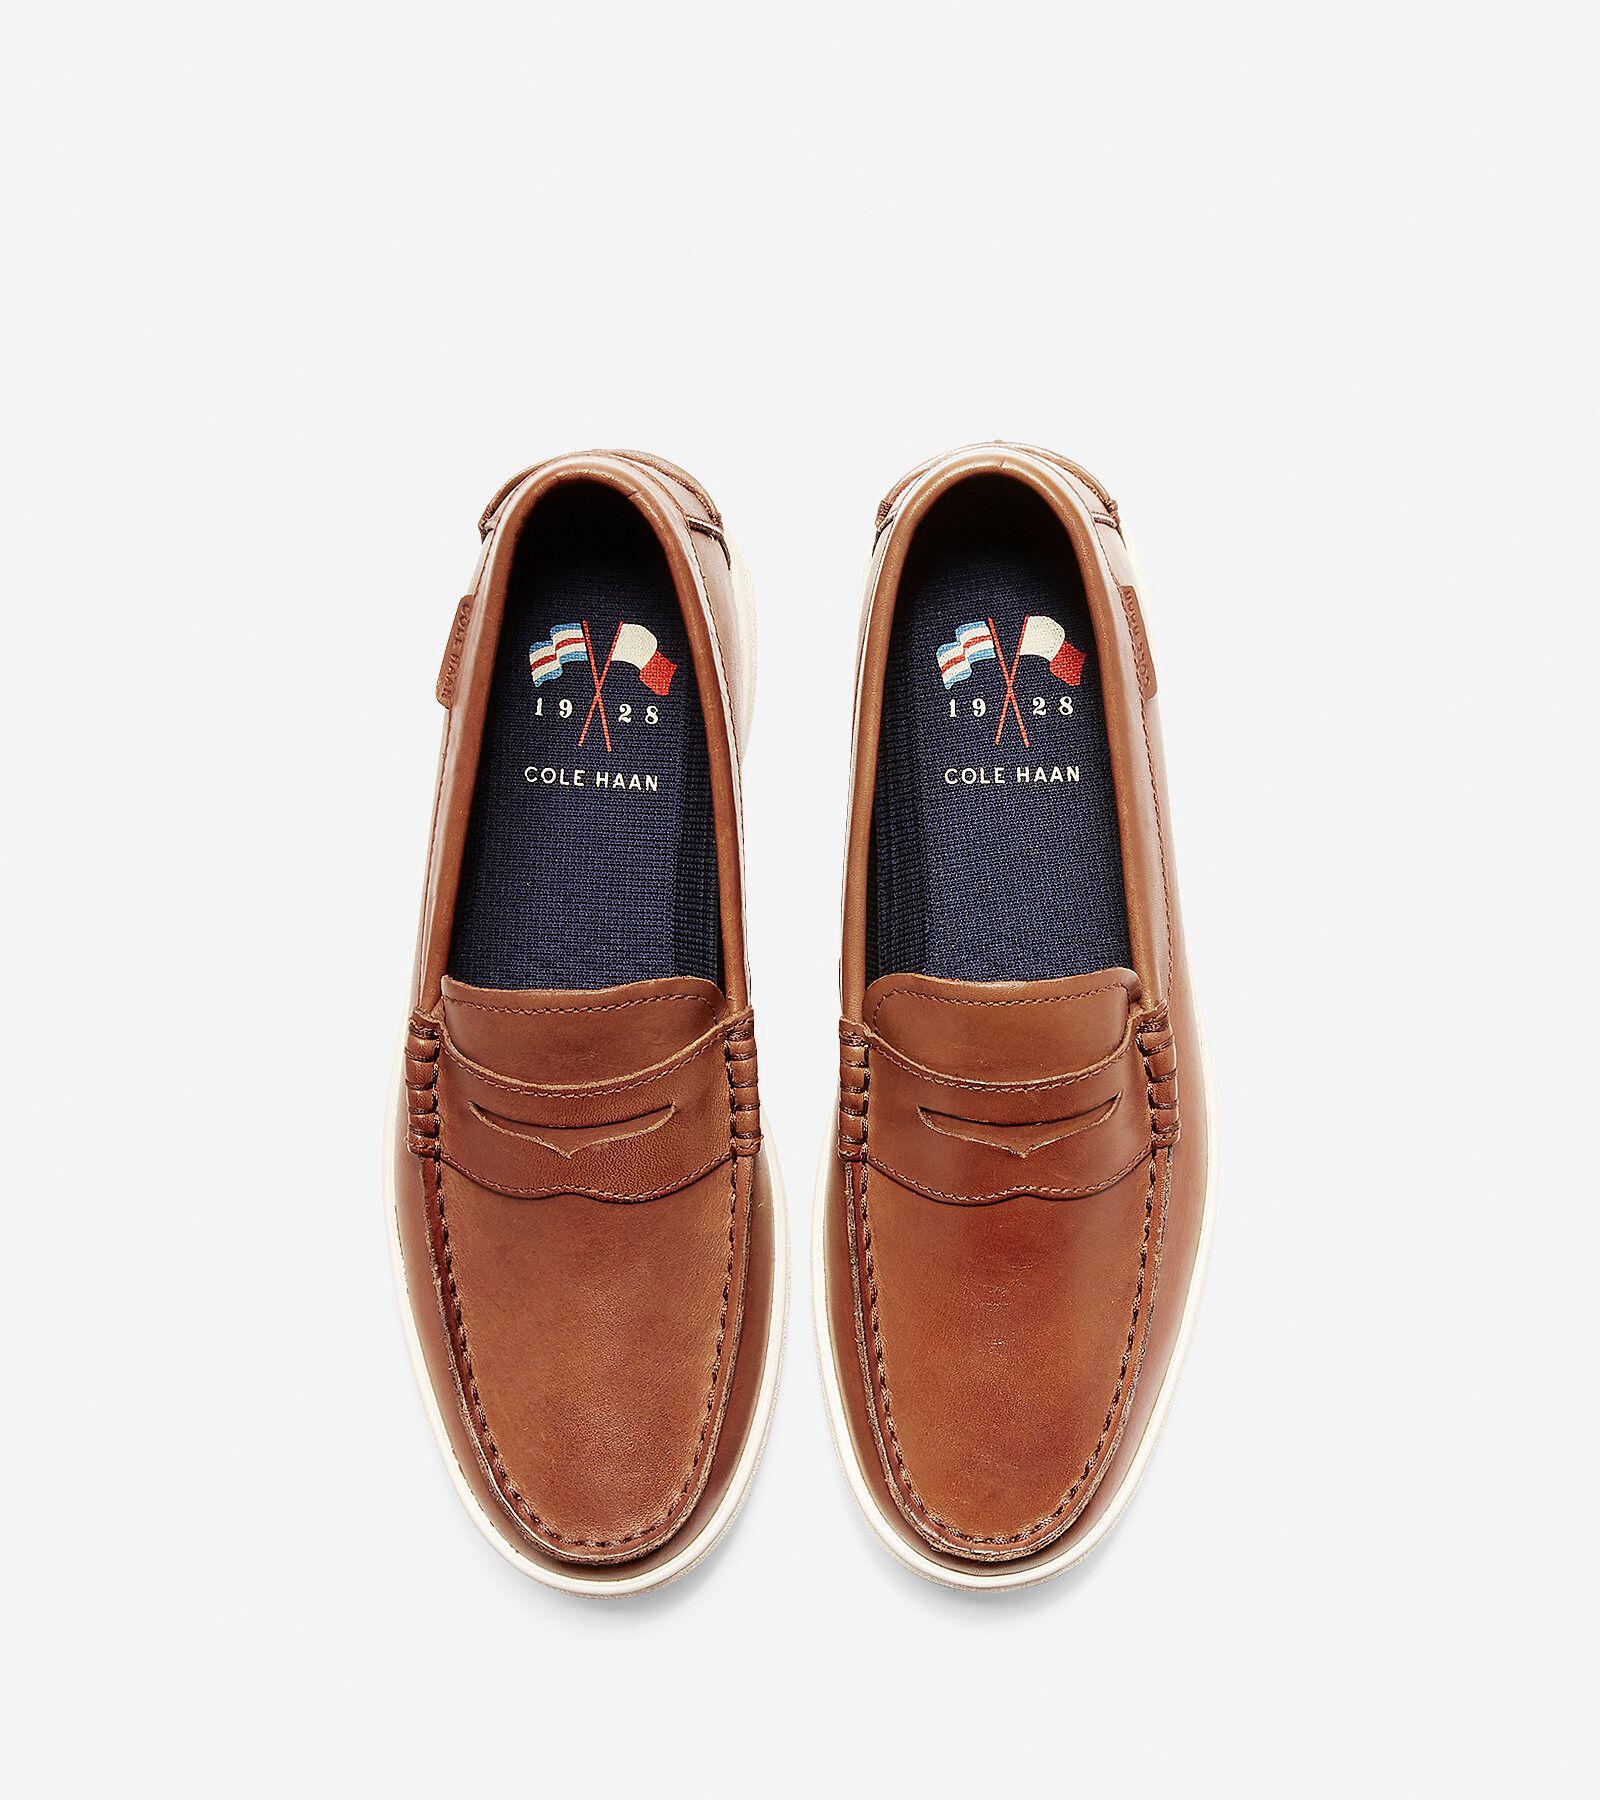 Men's Nantucket Loafer in British Tan